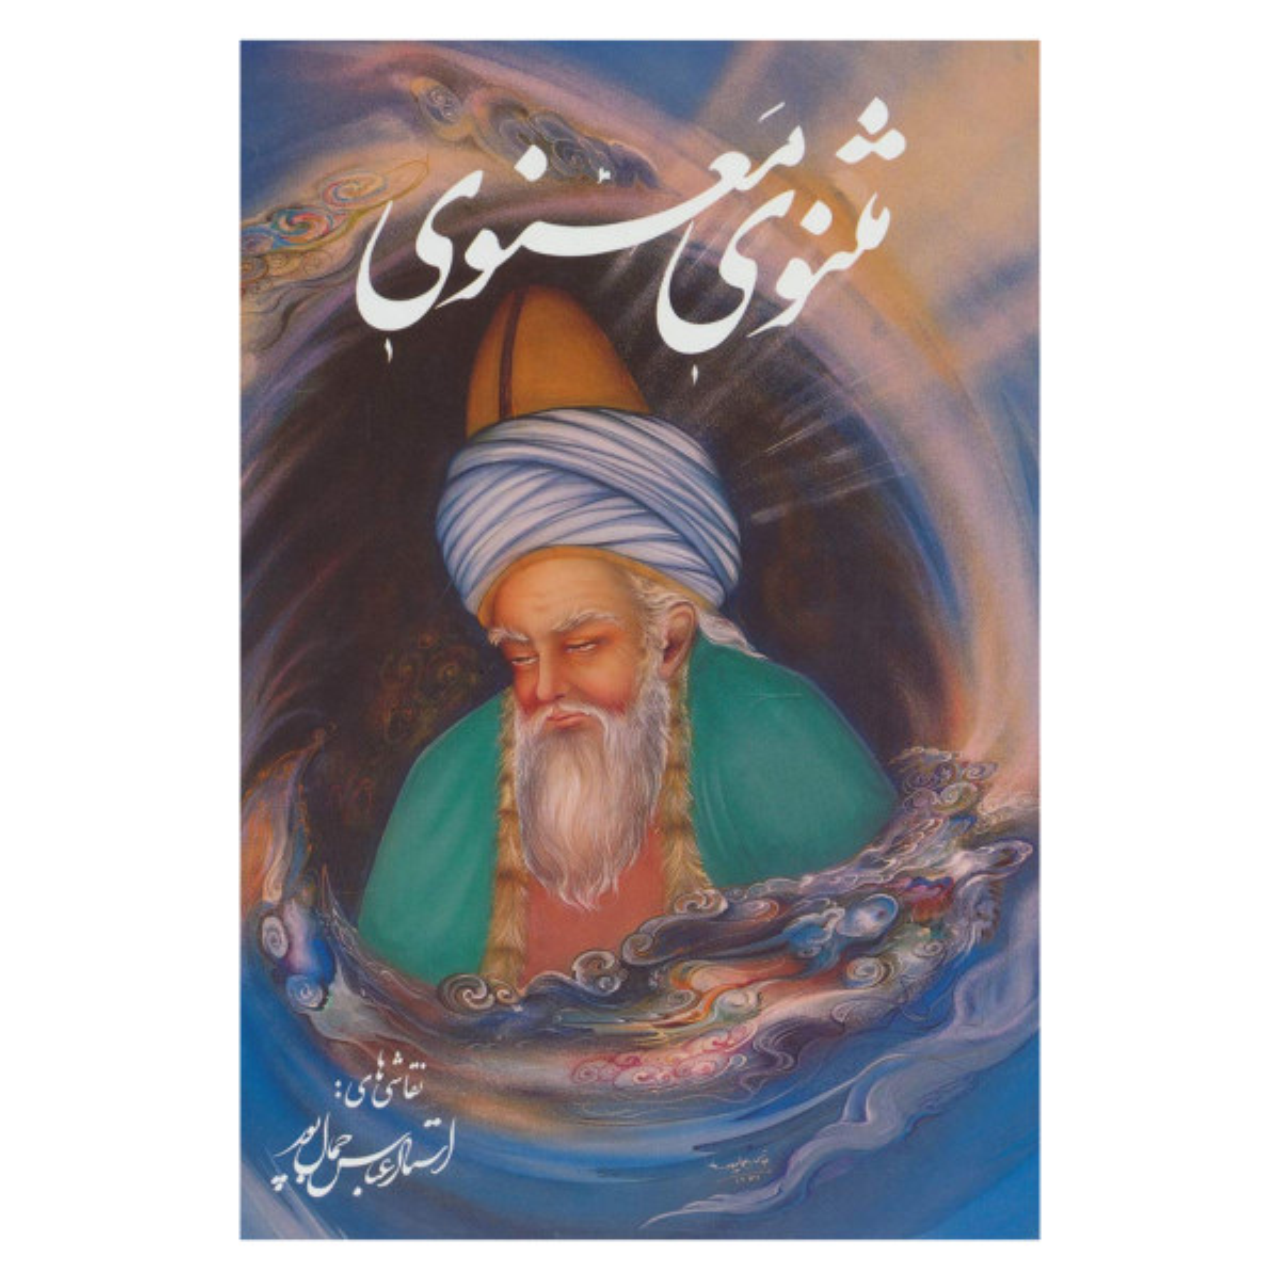 کتاب مثنوی معنوی اثر مولانا جلال الدین محمد بلخی انتشارات خانه فرهنگ و هنر گویا